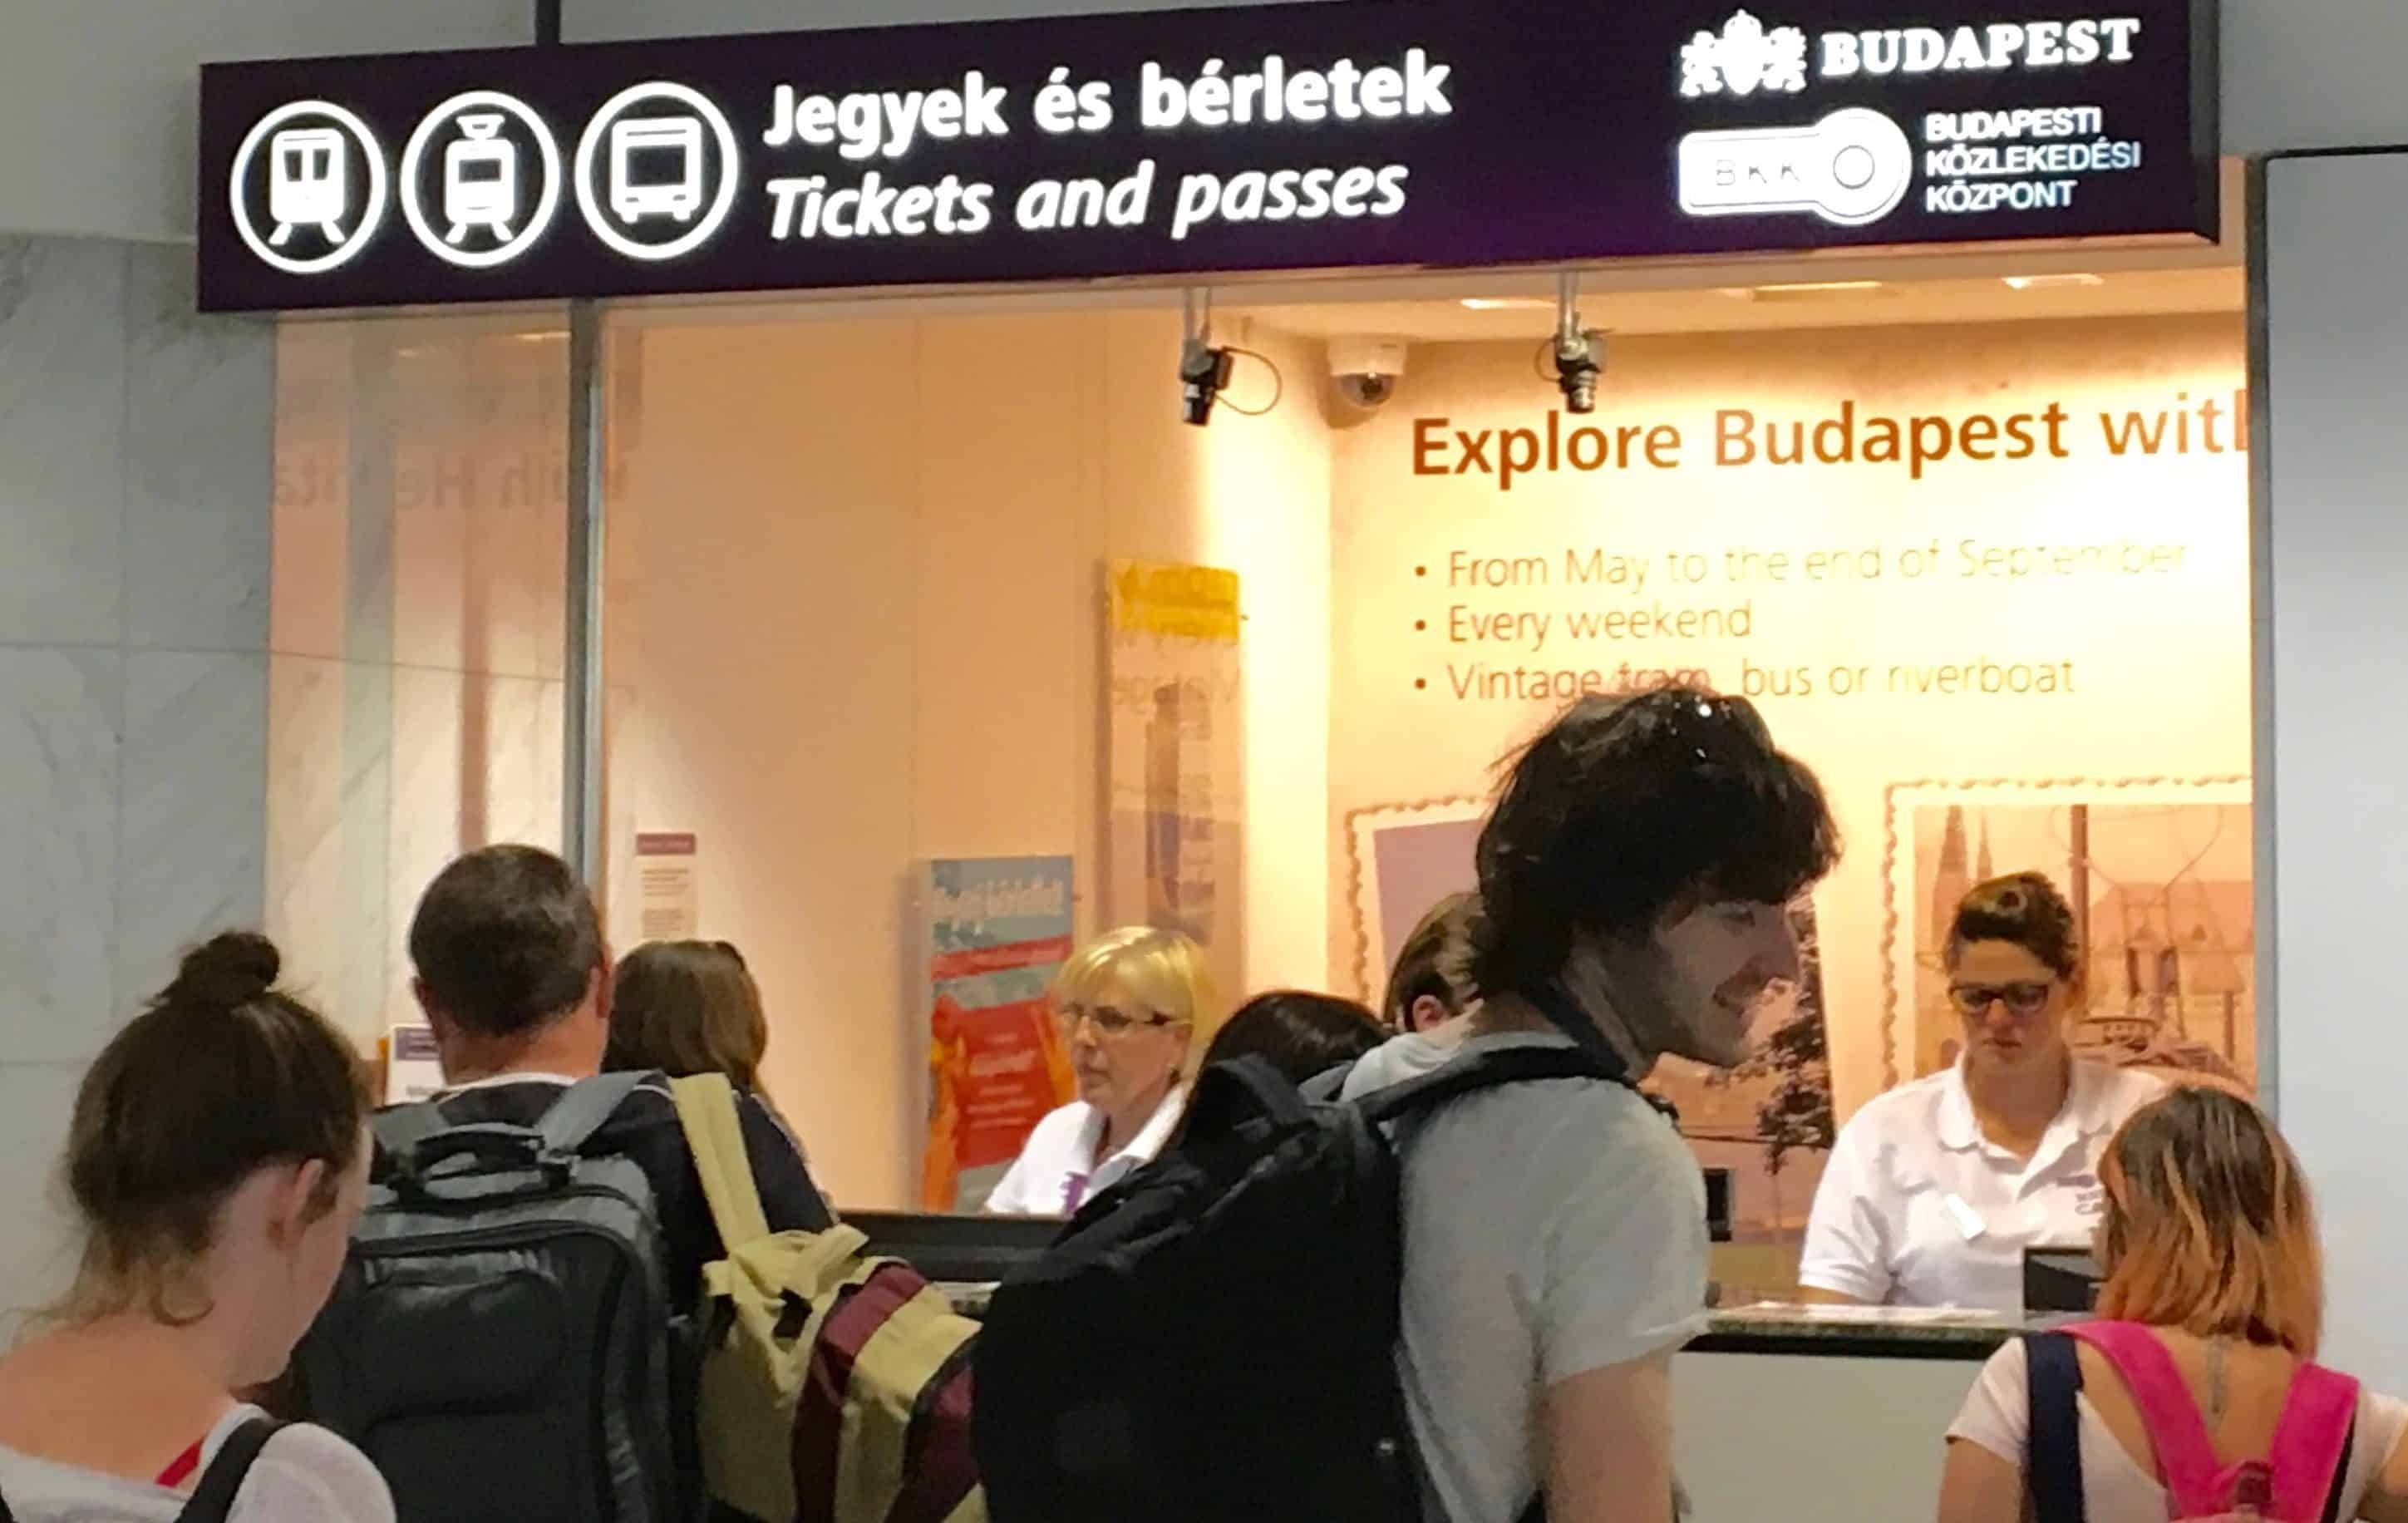 guichet tranports publics aeroport budapest